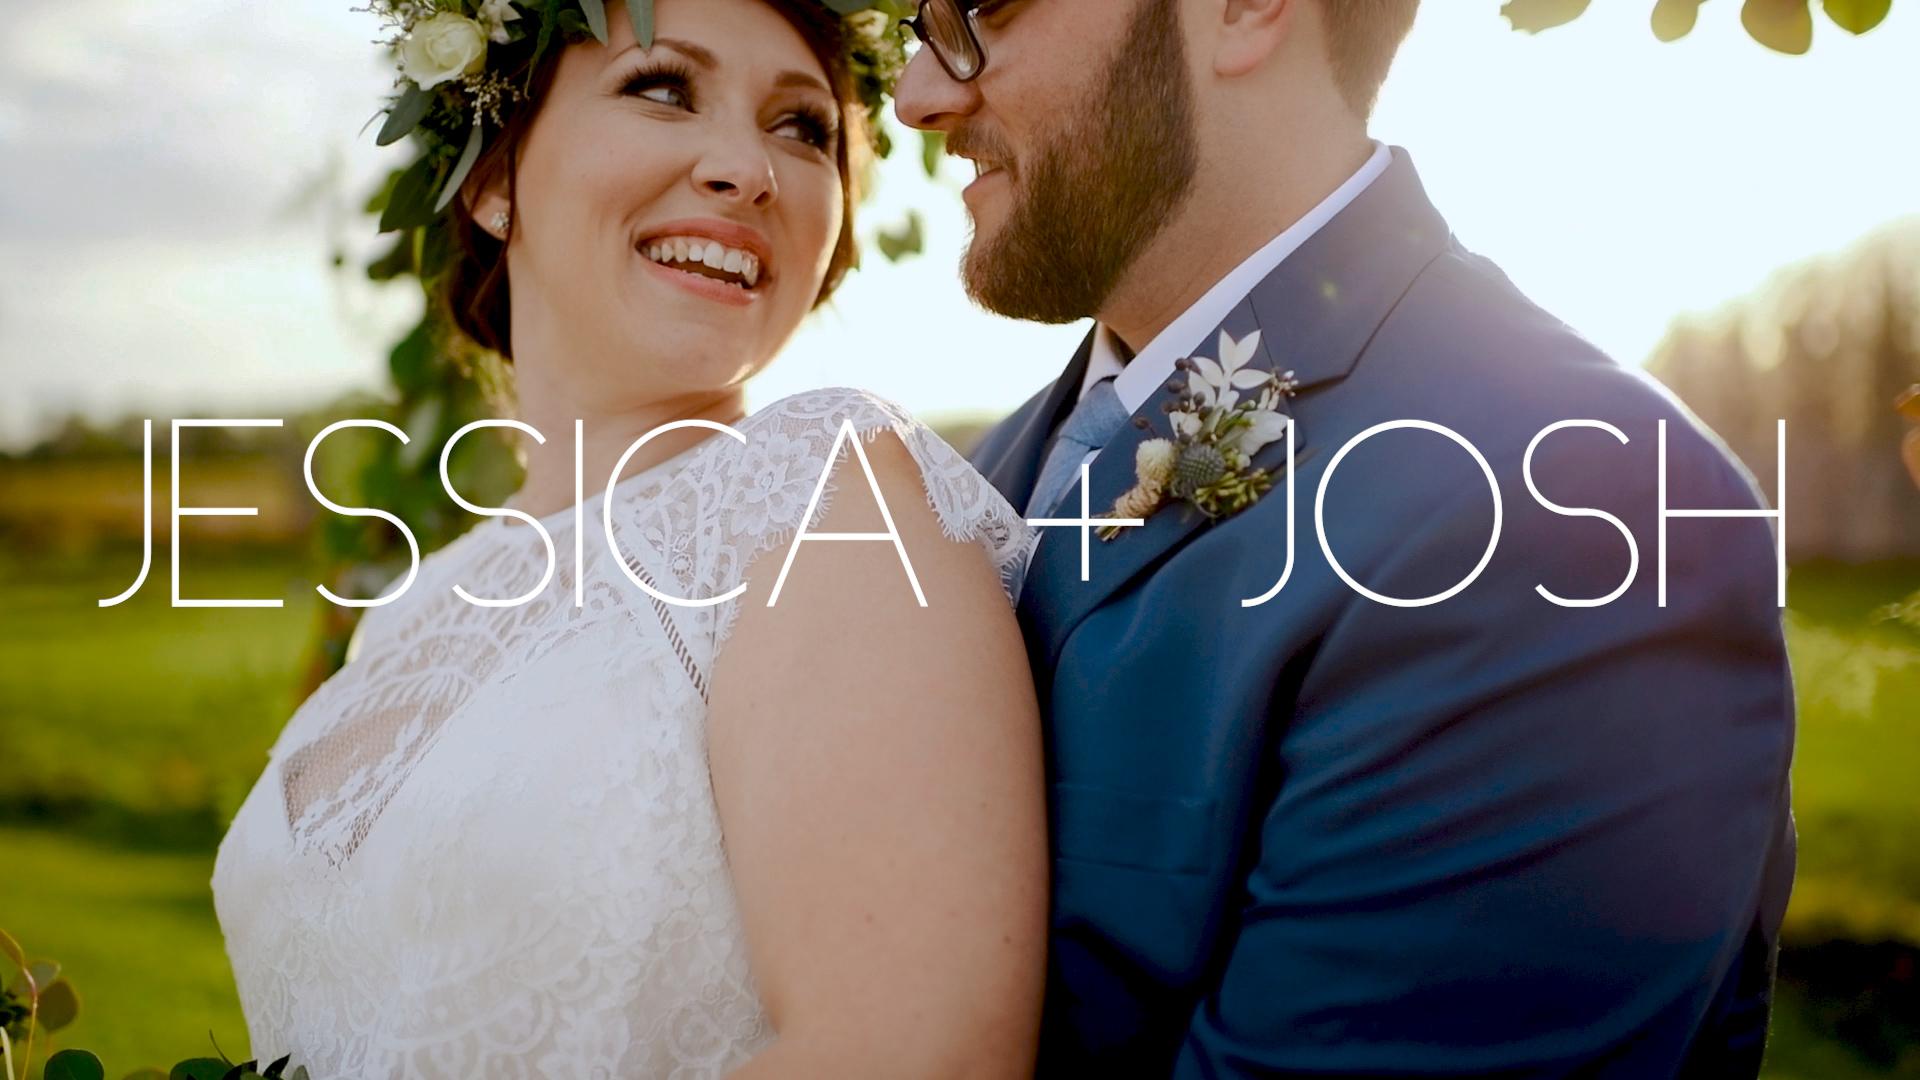 Jessica + Josh | Polk County, Florida | A Barn